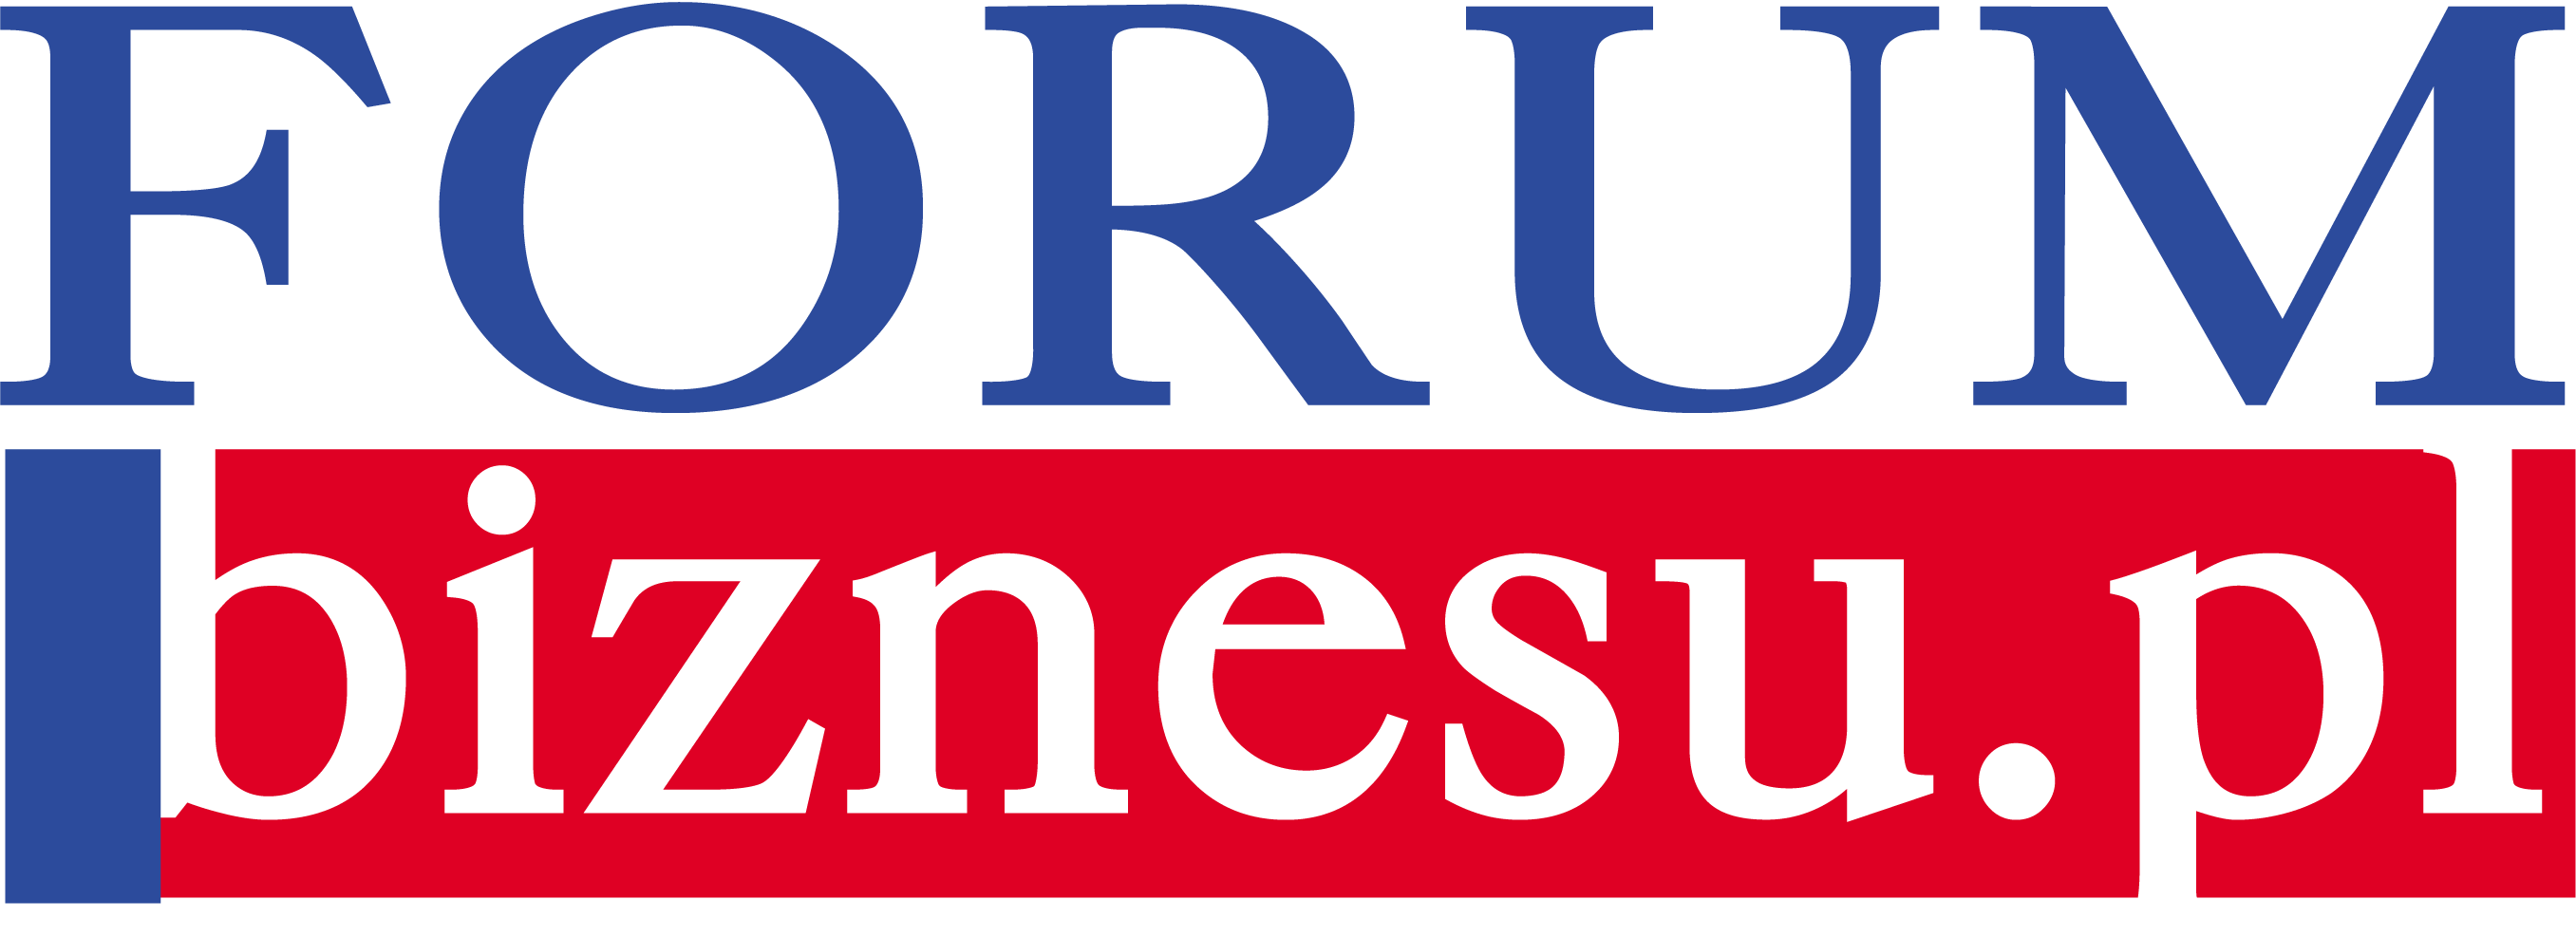 Forum Biznesu logo